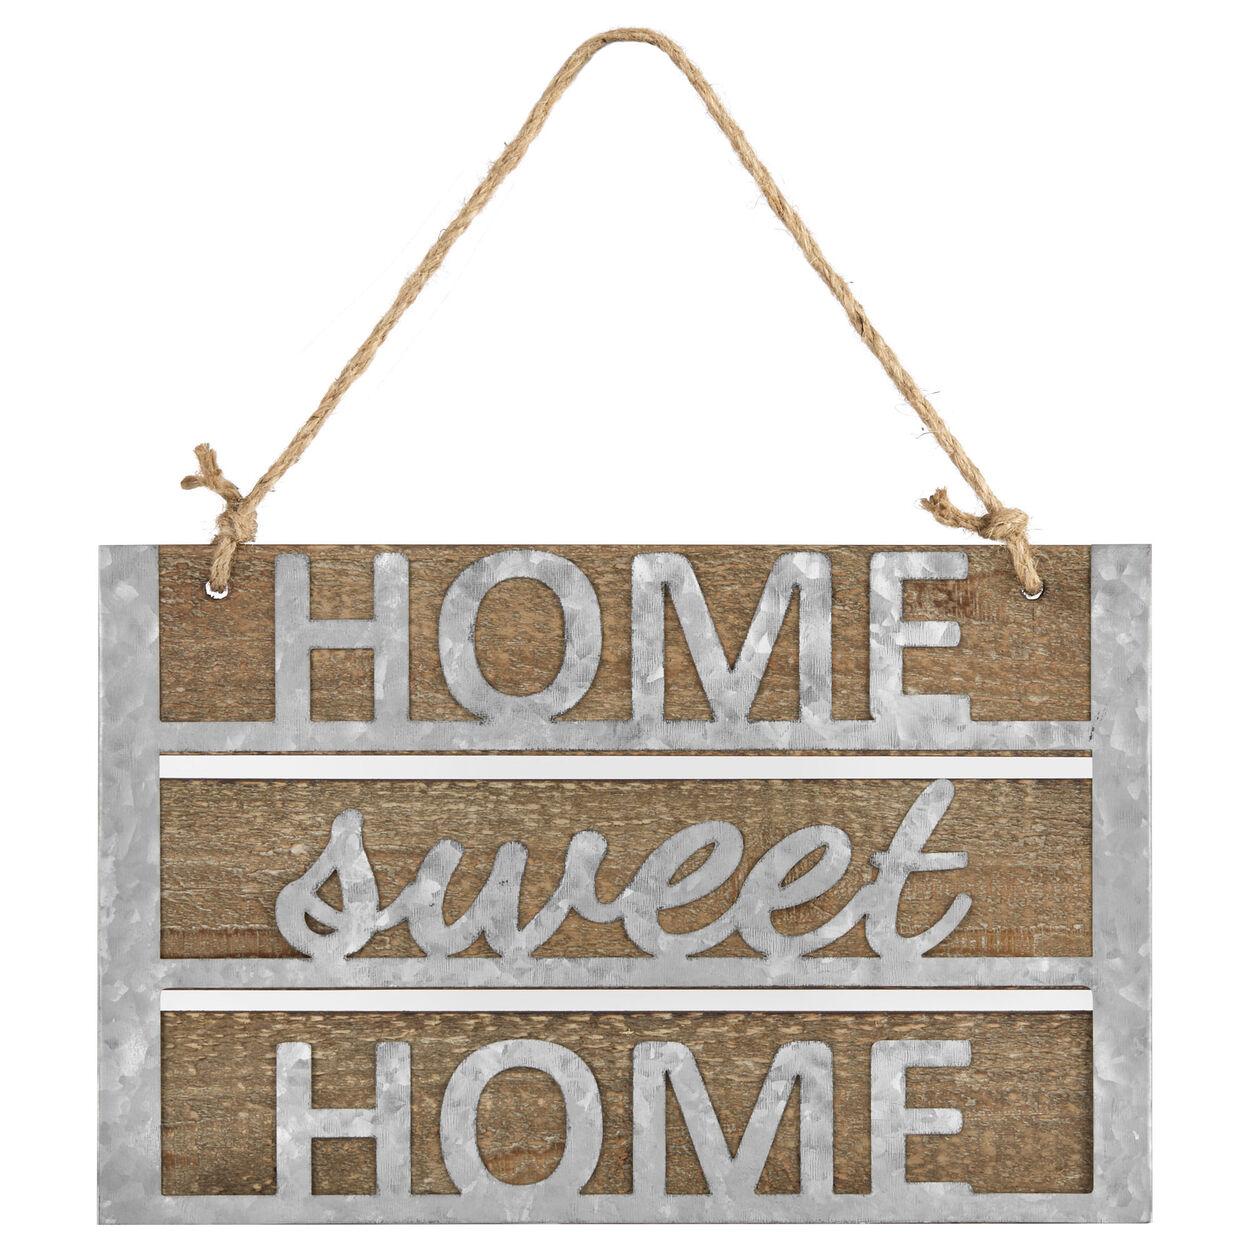 Home Sweet Home Wood & Metal Hanging Wall Art